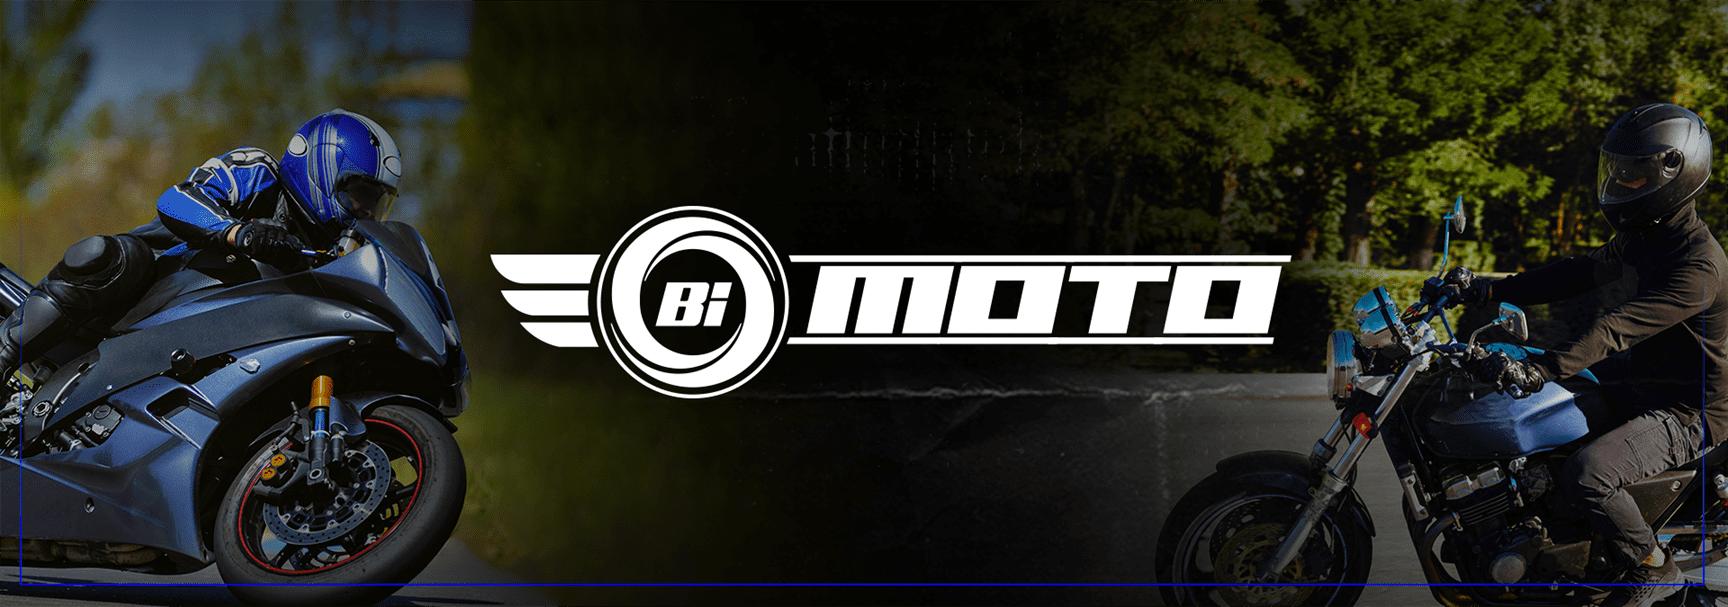 BiMoto en Línea - Todos